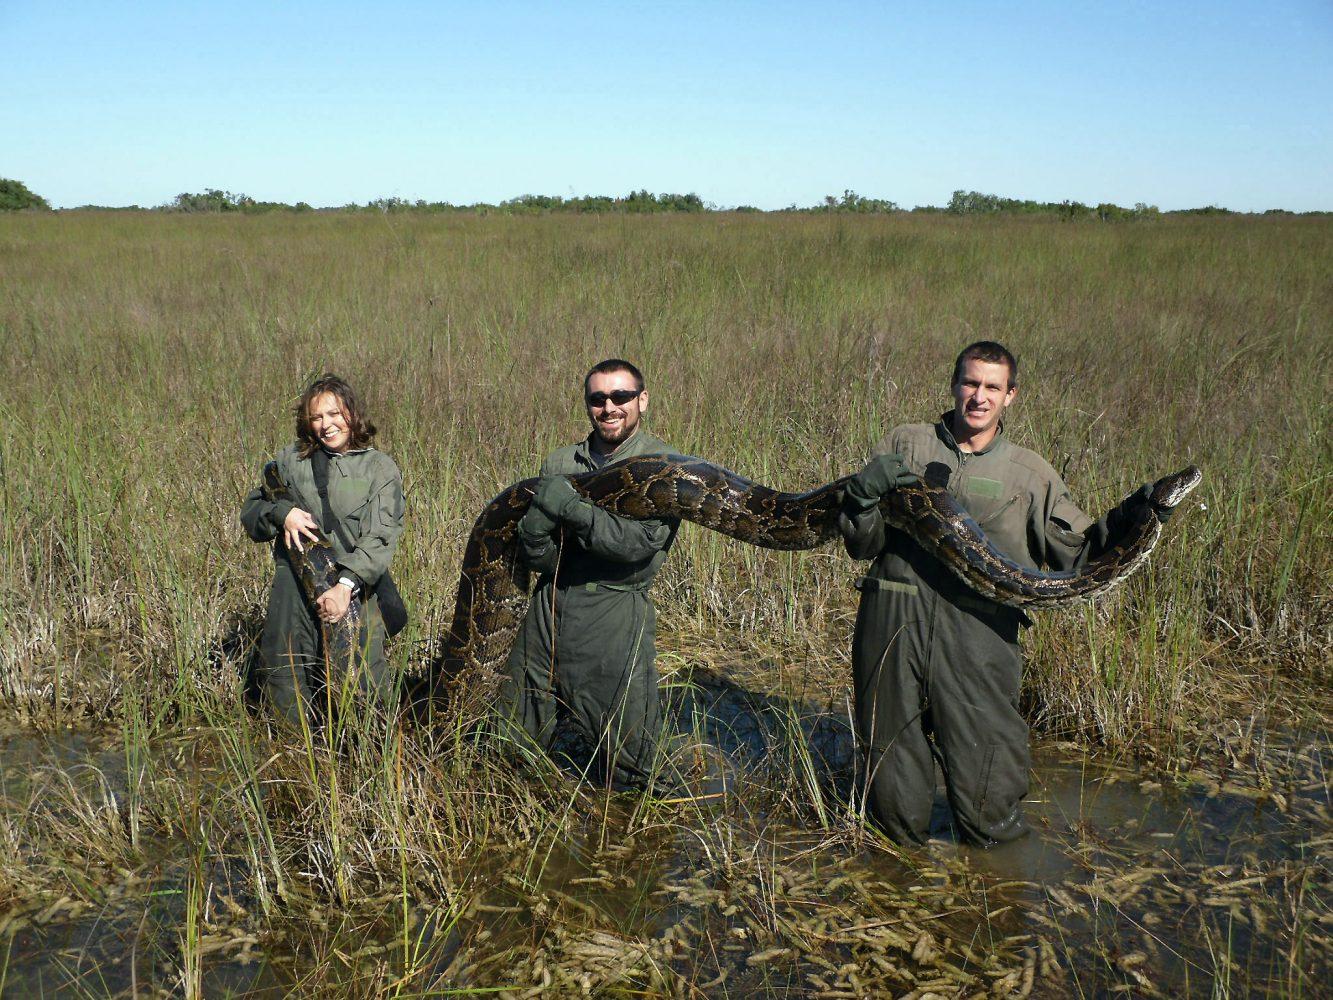 Governing the Natural Environment